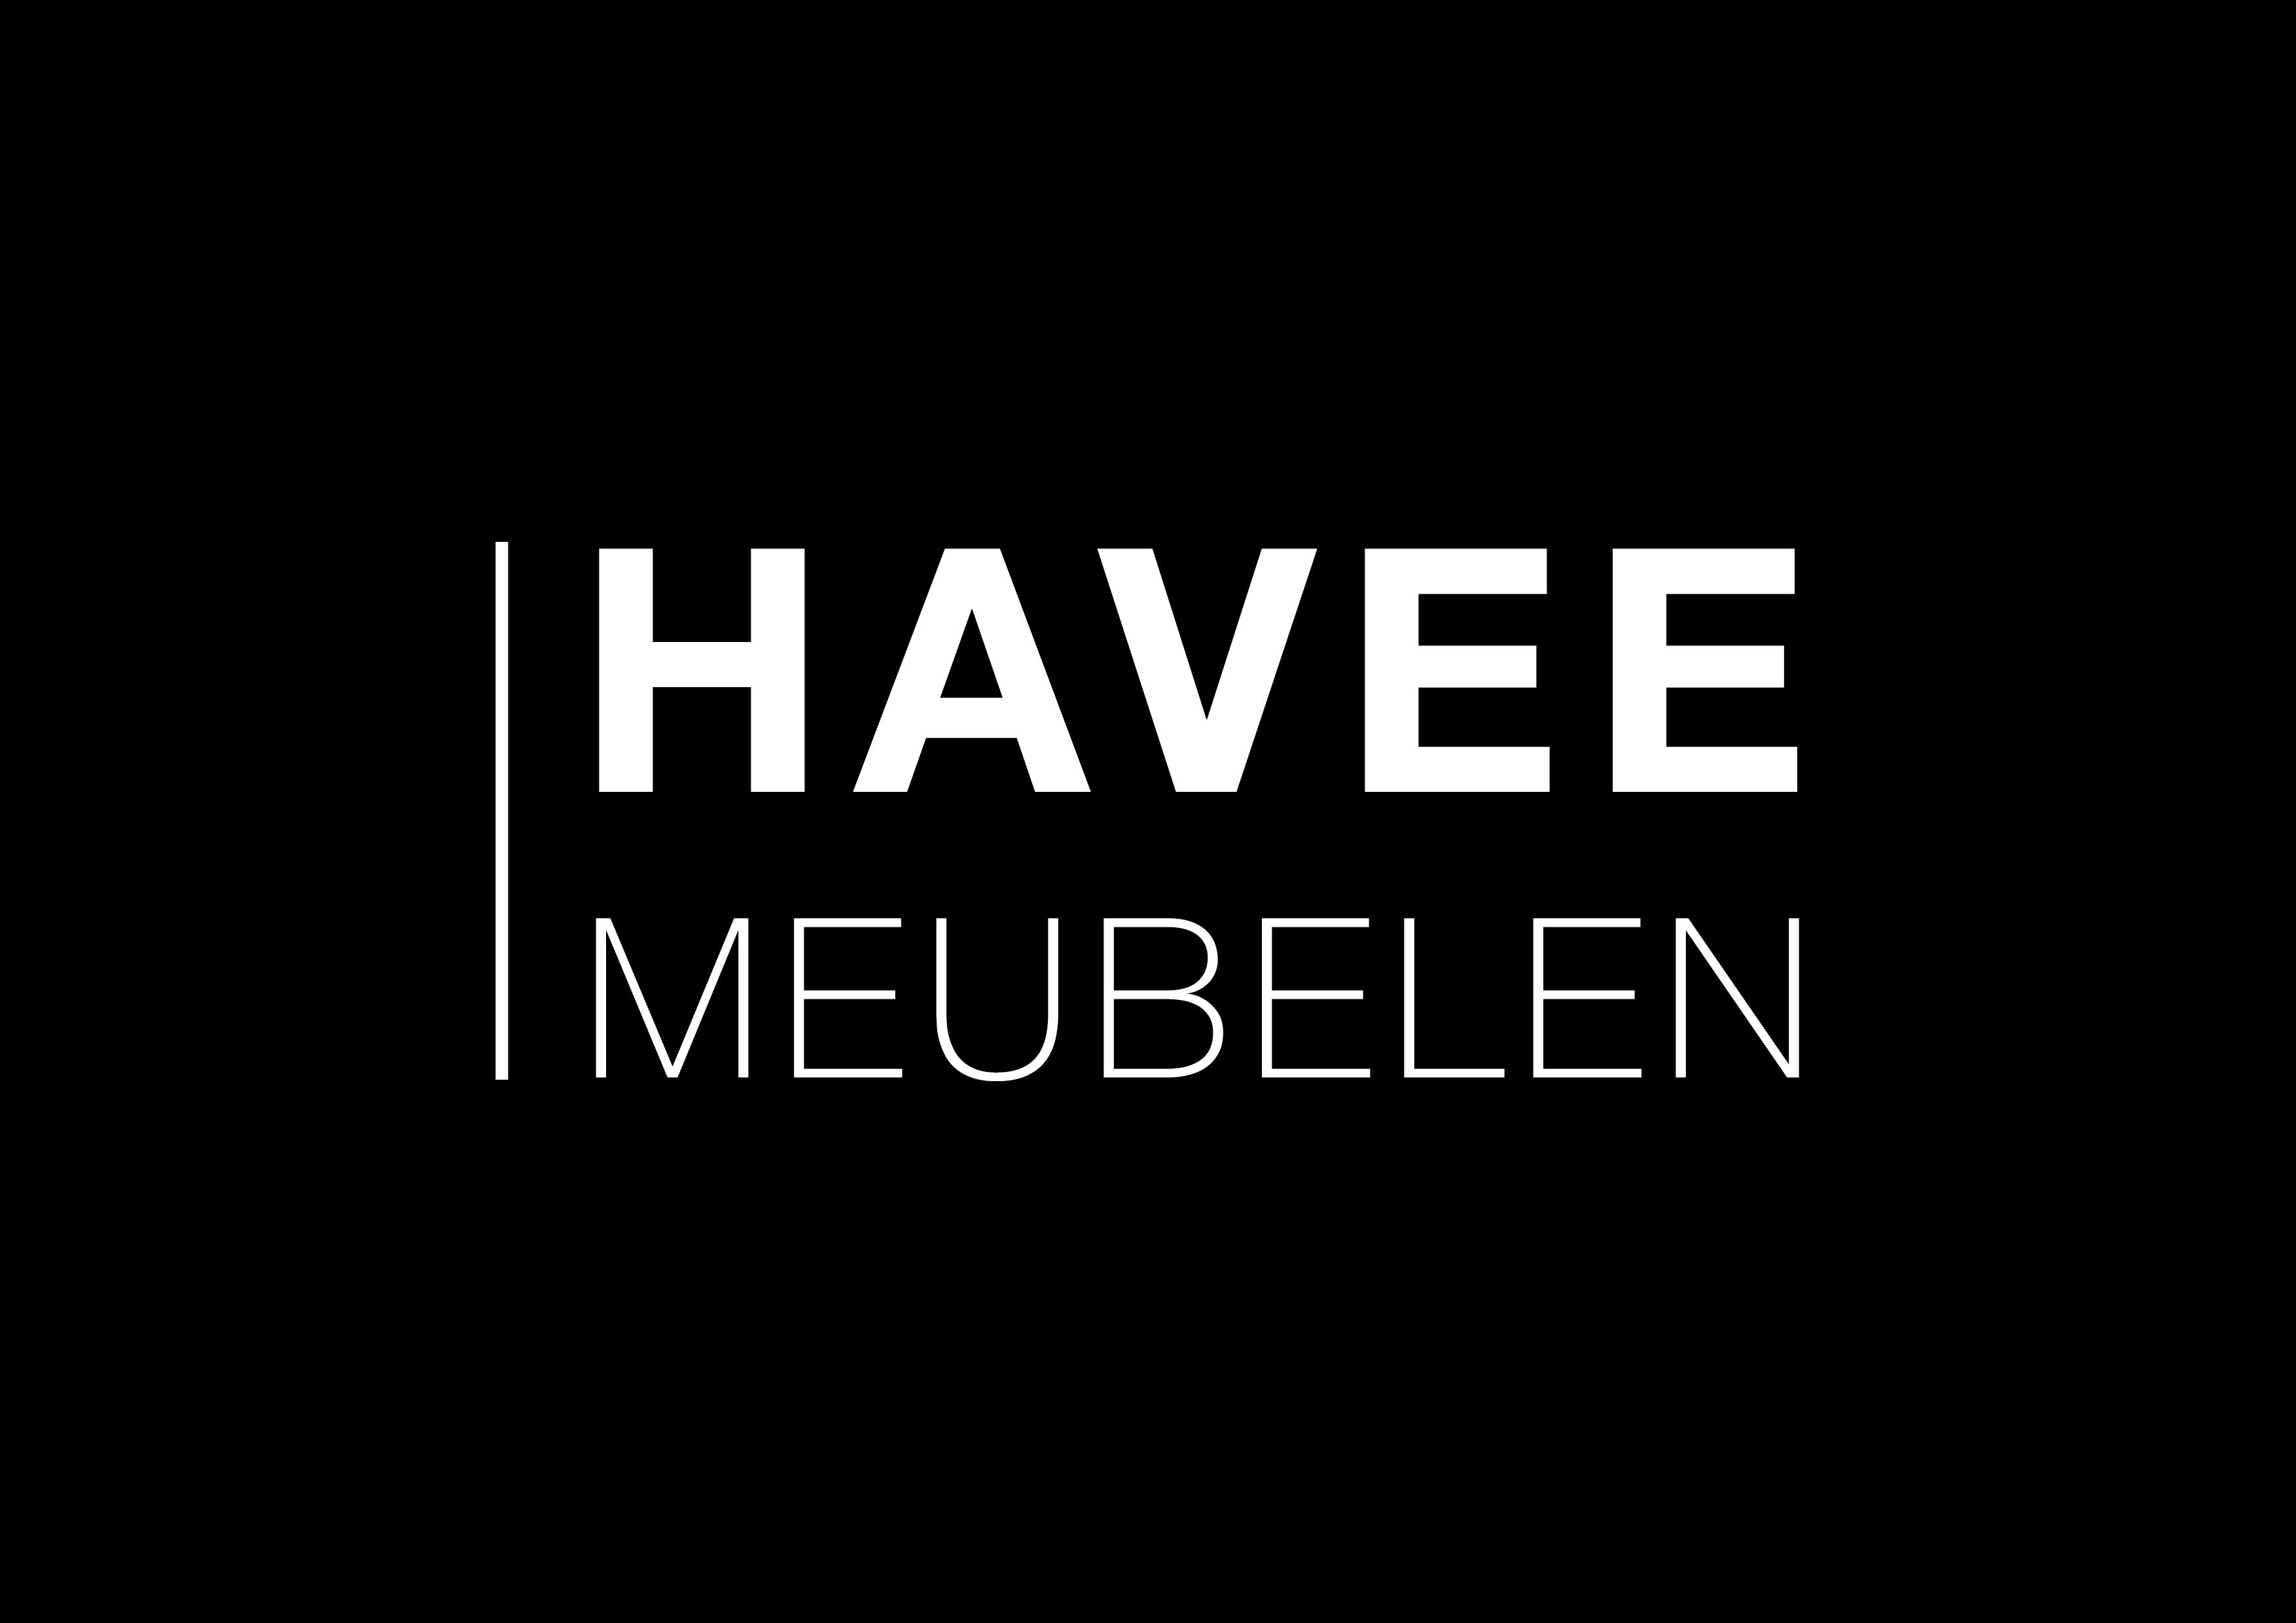 Havee